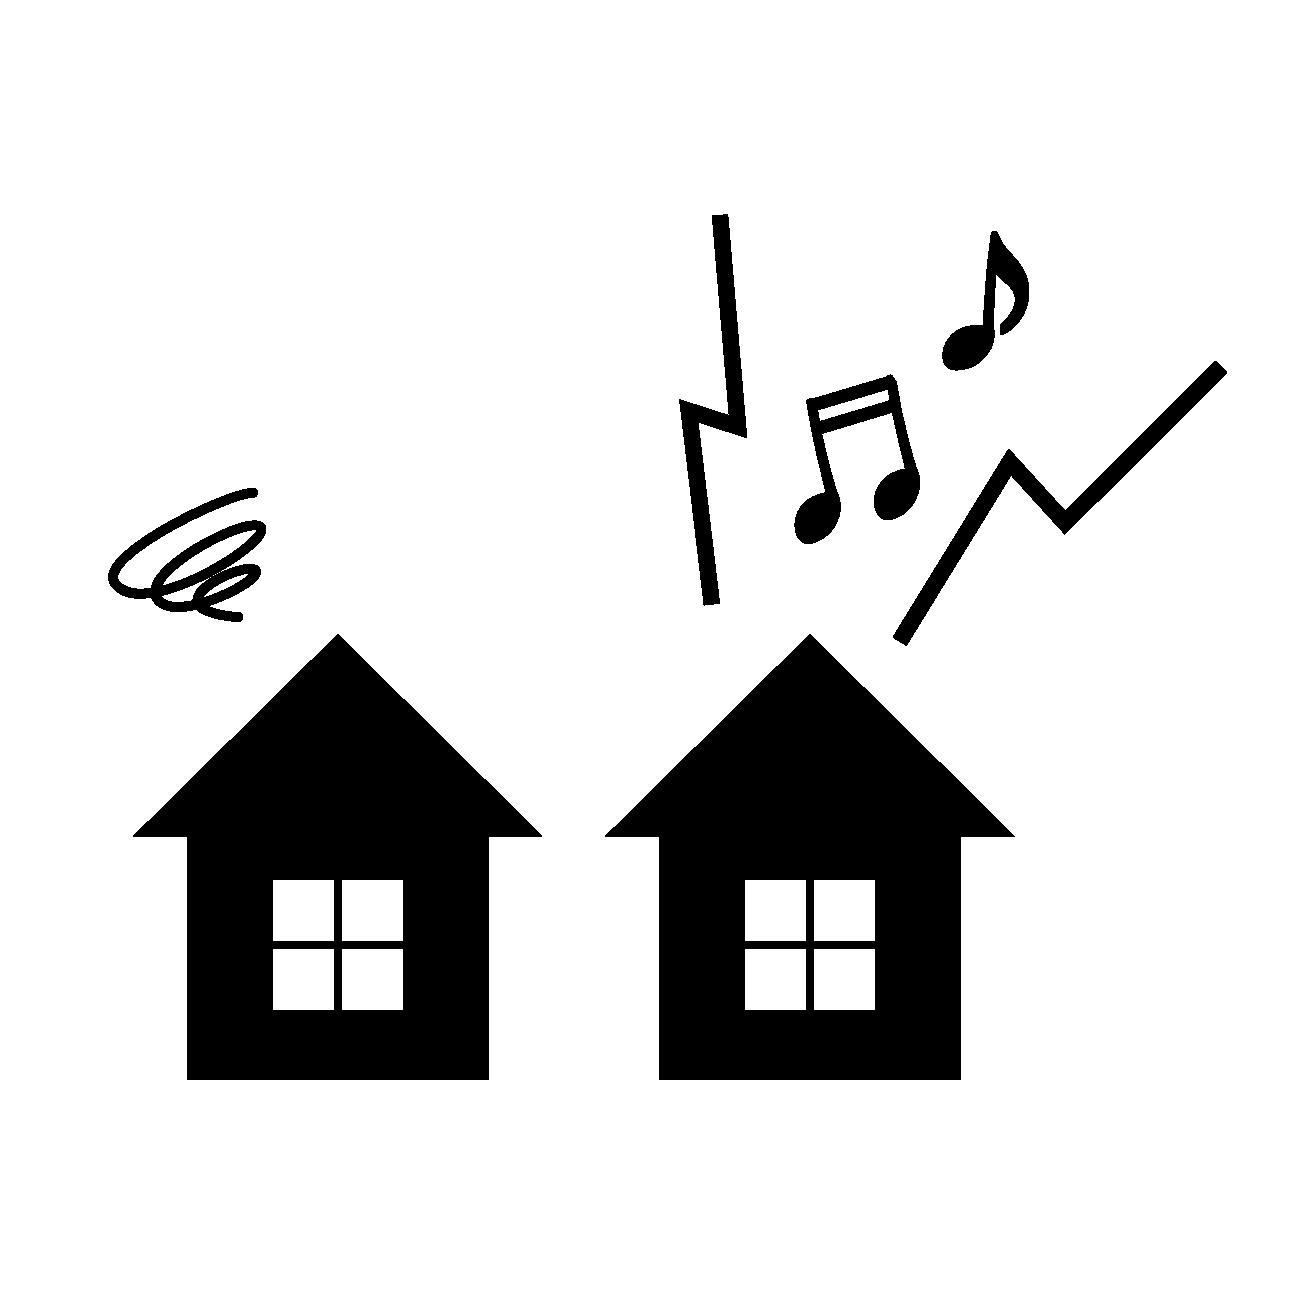 集合住宅の騒音対策